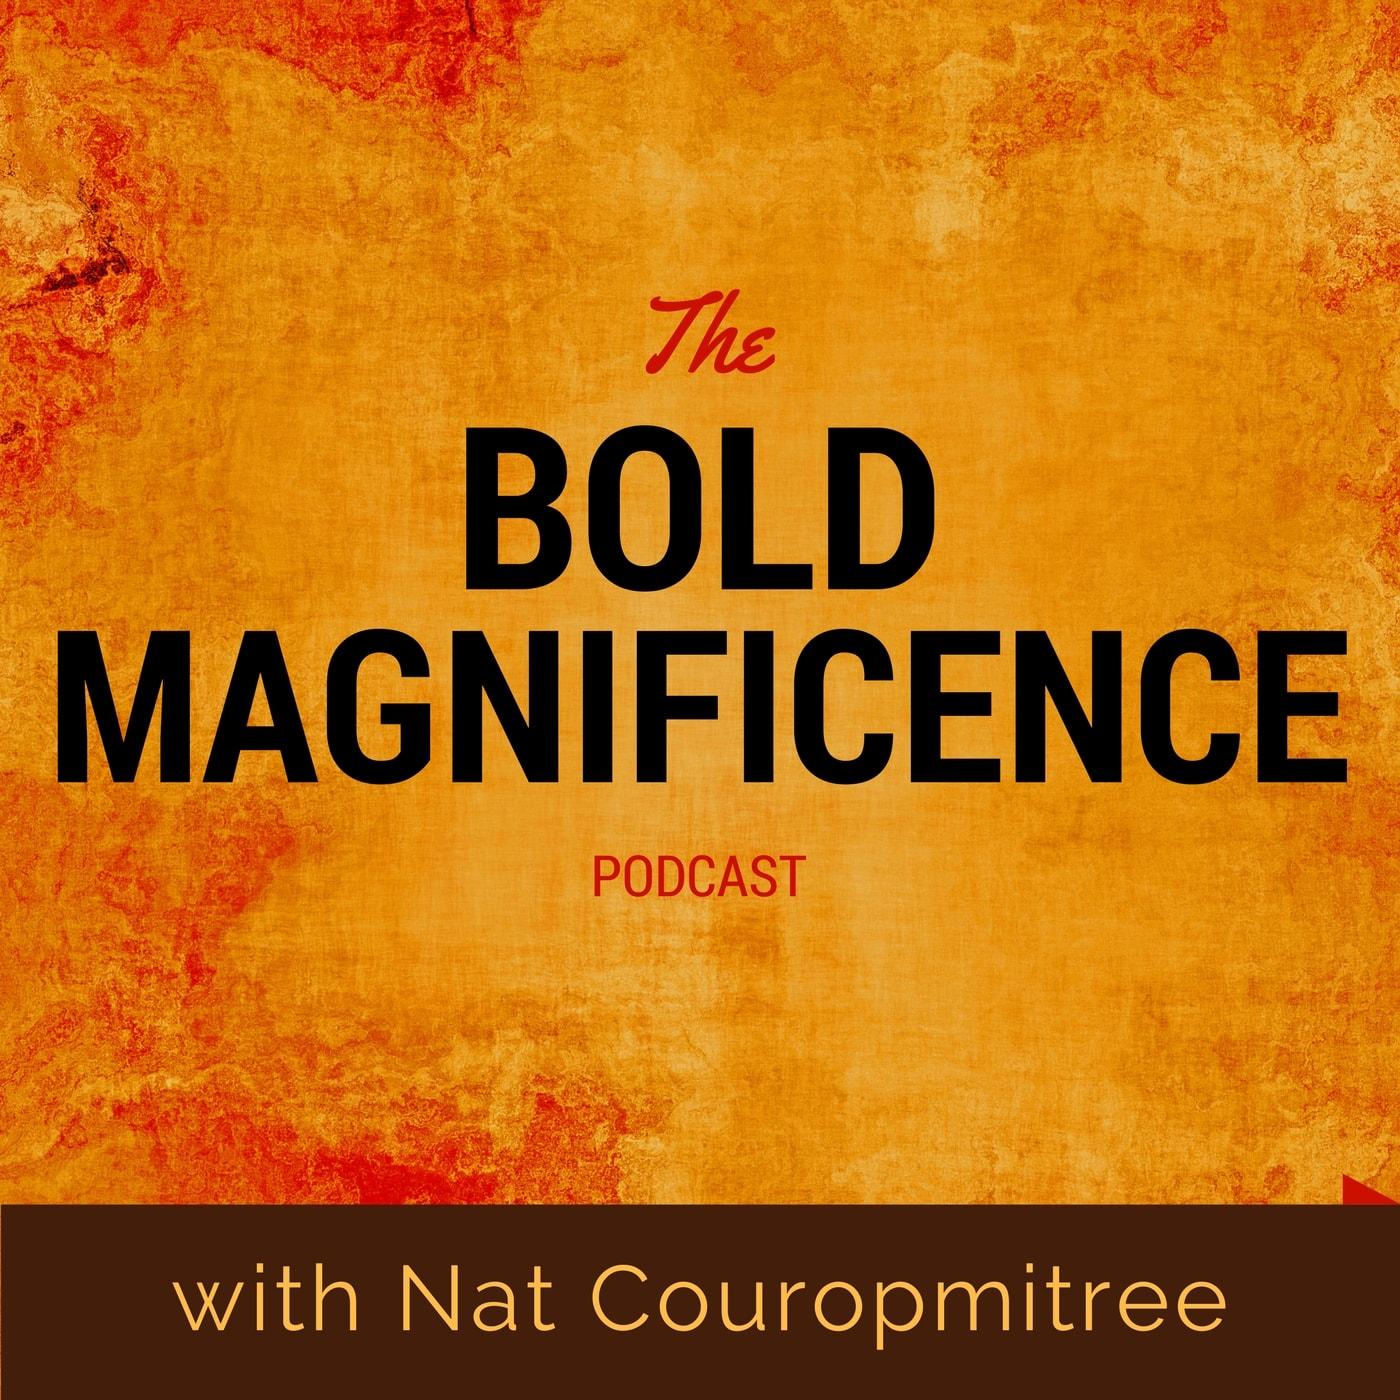 Bold Magnificence Podcast-min.jpg